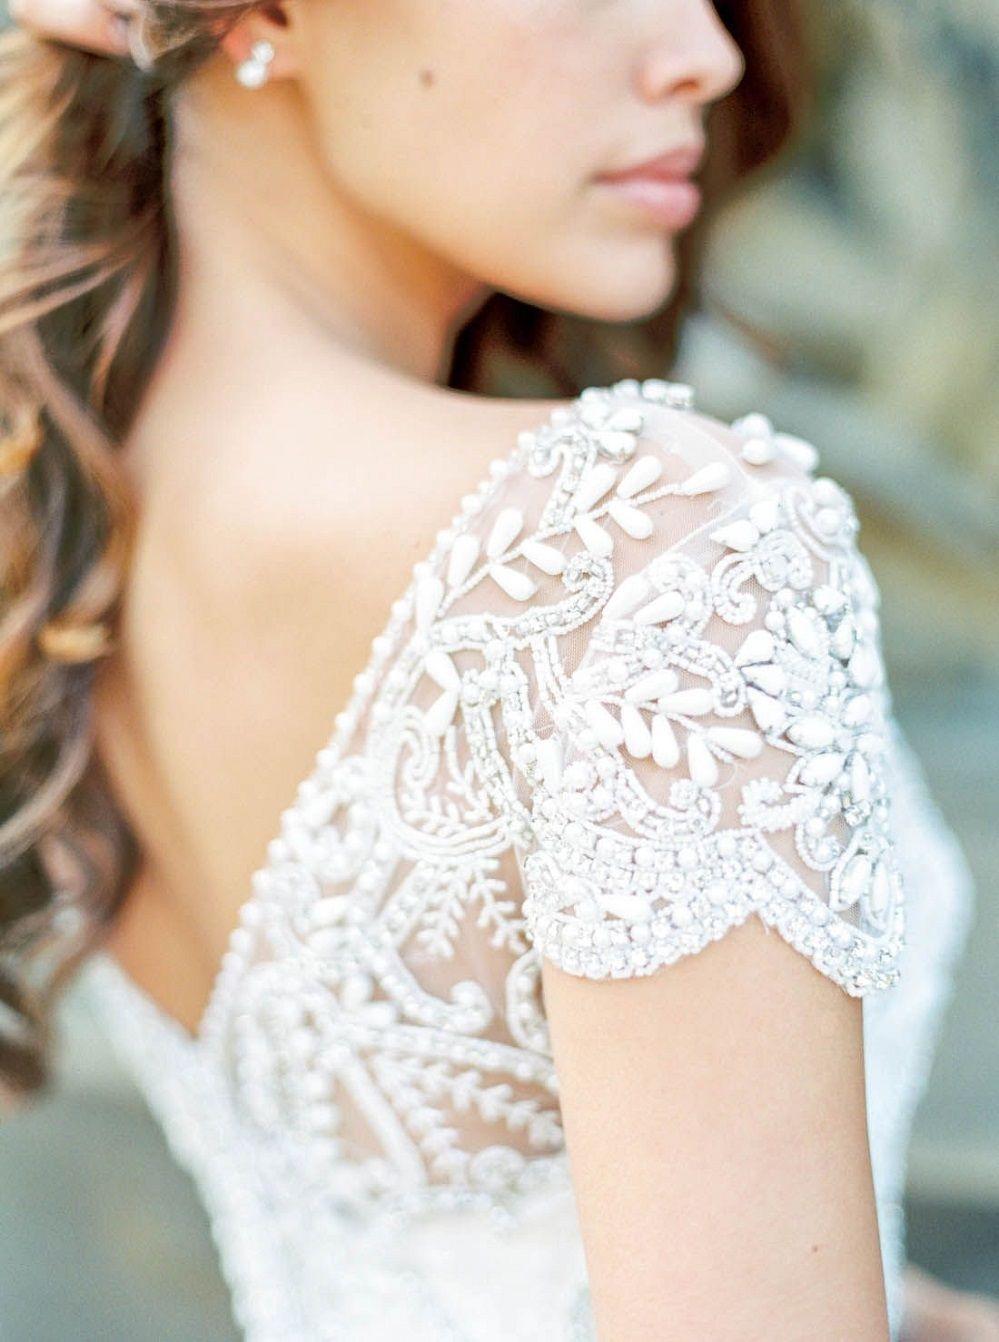 Best Alternative Wedding Dresses to Swoon Over Stunning wedding dresses with amazing details, lace wedding dress,long sleeves wedding dress,deep plunging neckline wedding dress,heavy embellishment wedding dress #weddingdress #weddinggown